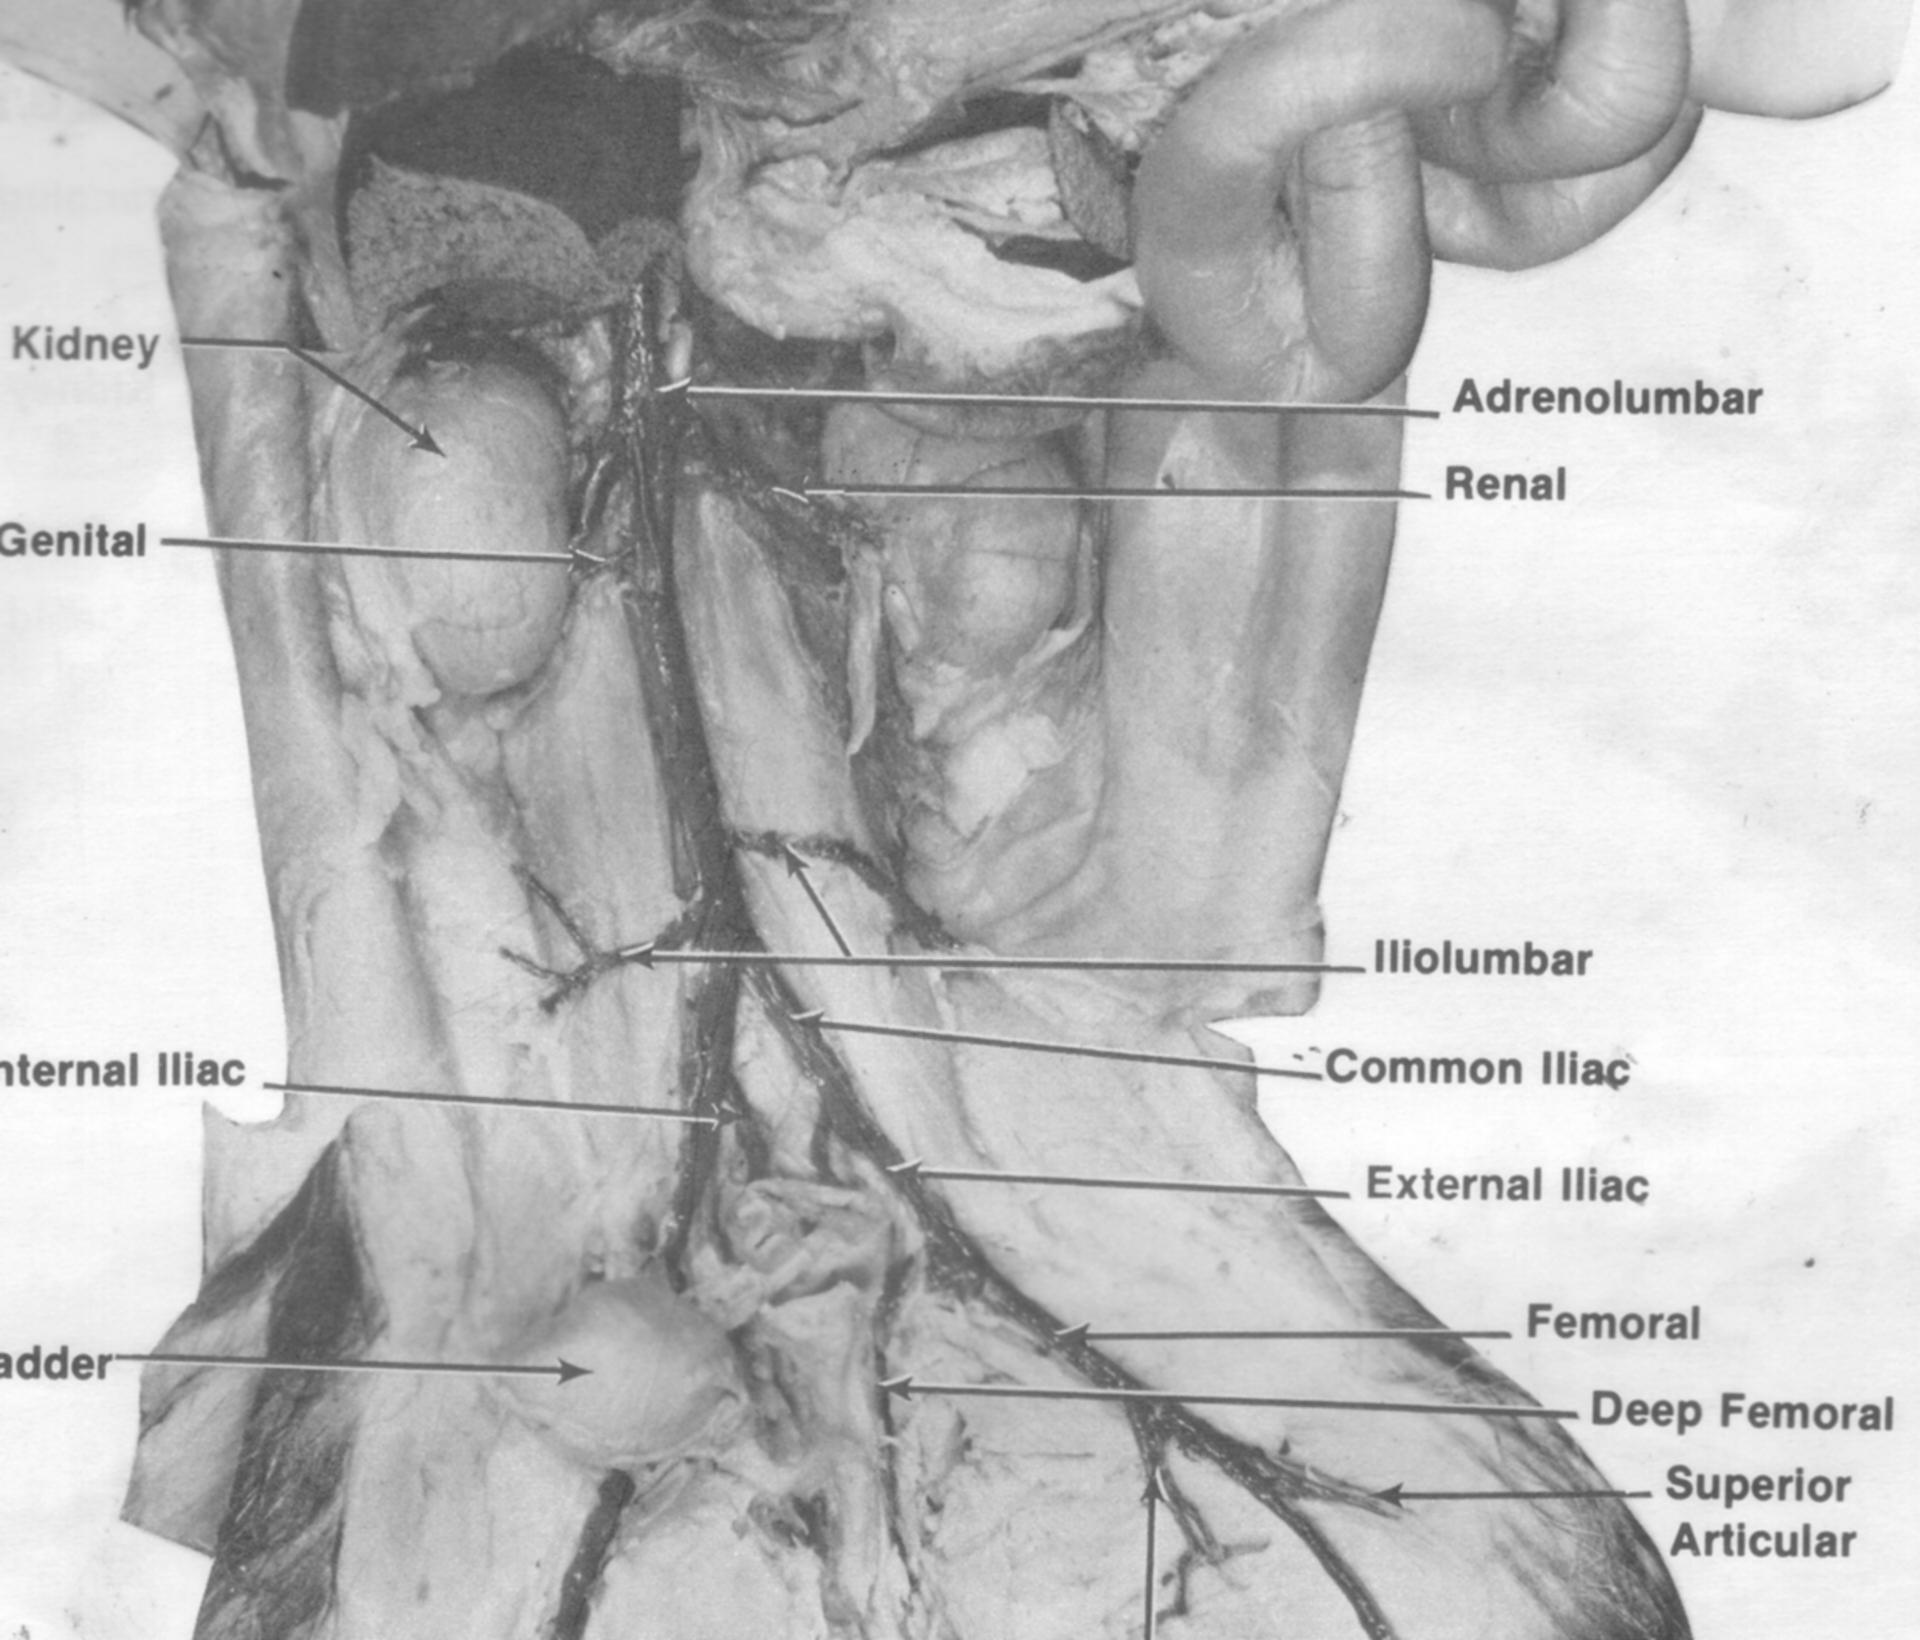 cat muscle anatomy diagram 2007 gmc sierra wiring radio untitled document mreroh